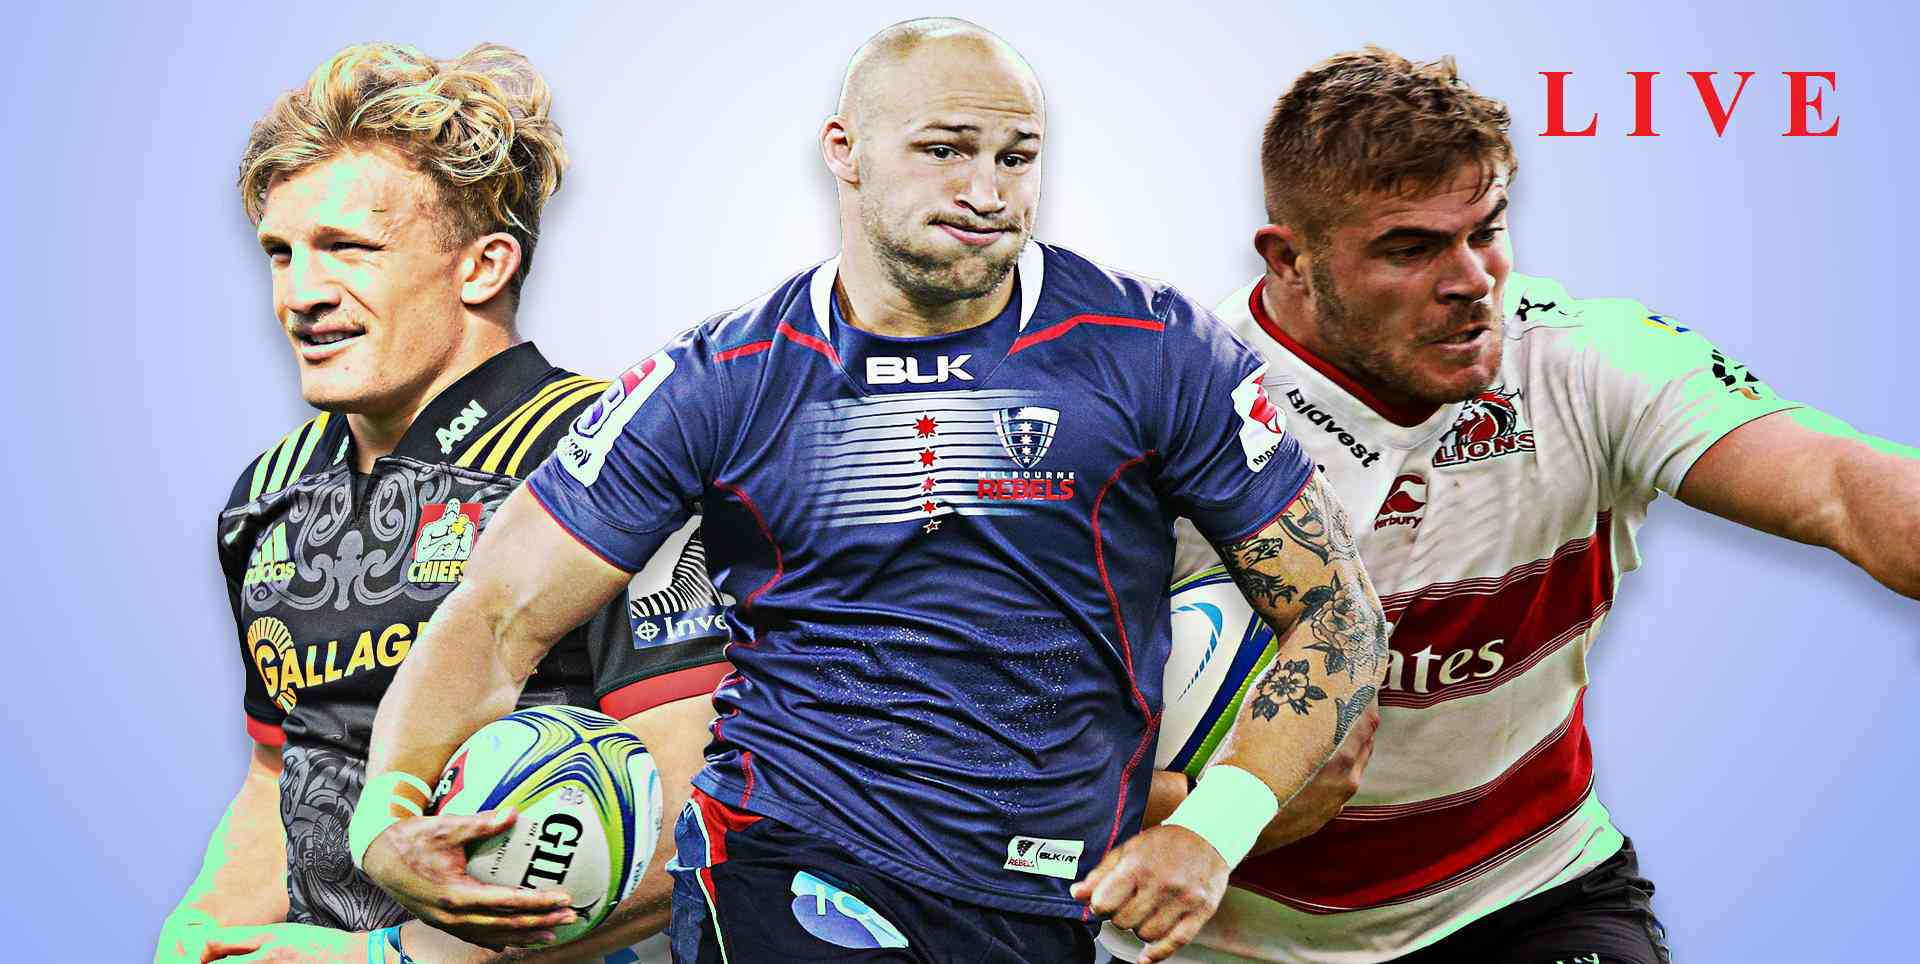 zebre-vs-glasgow-warriors-rugby-live